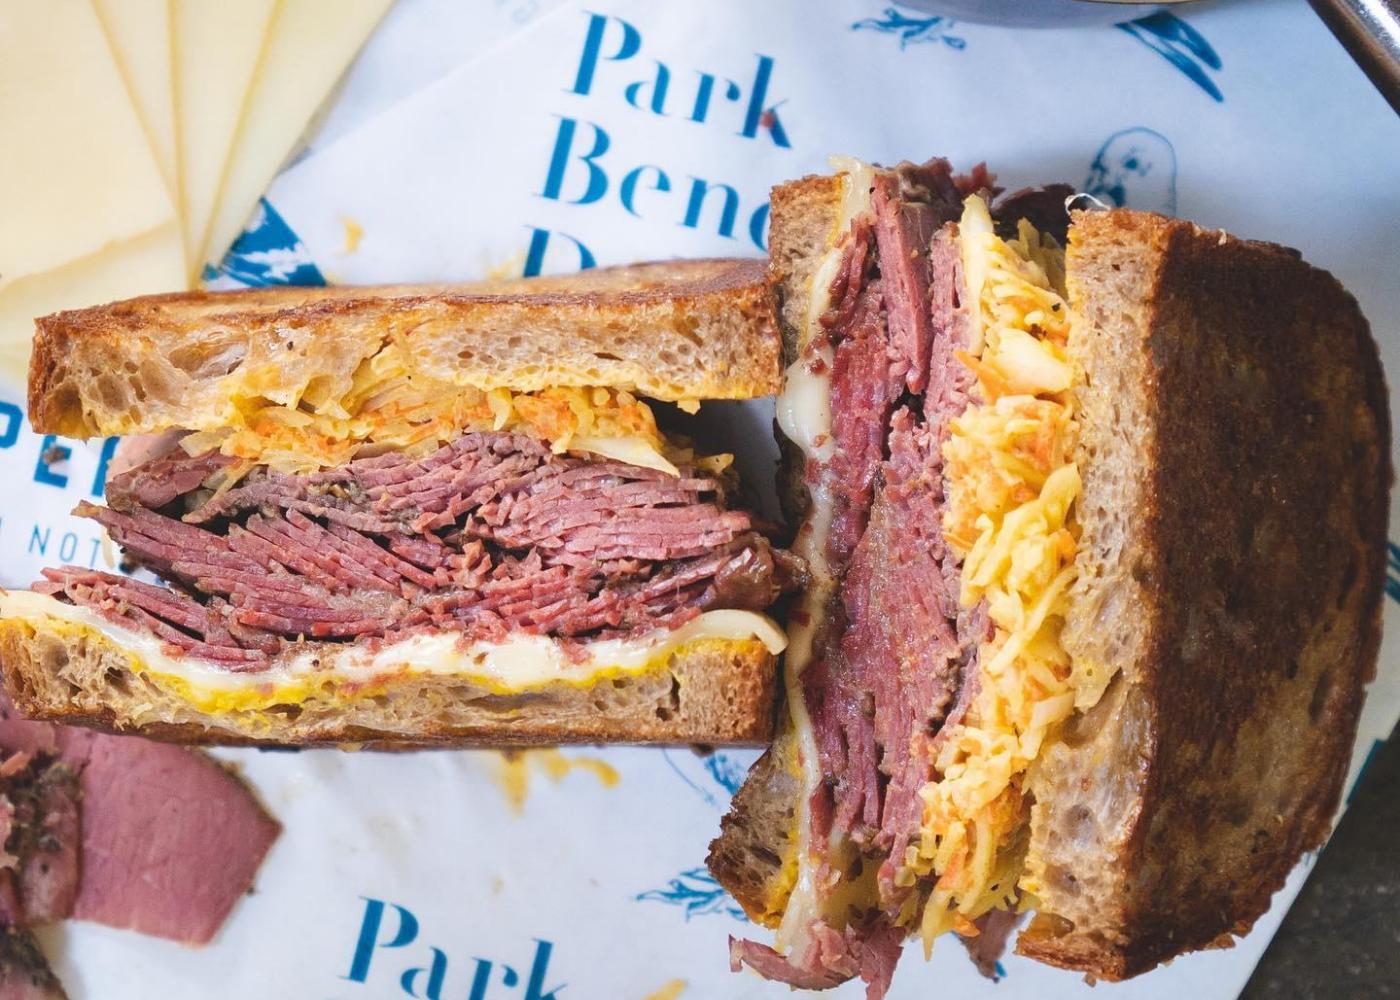 park bench deli | best sandwiches in singapore